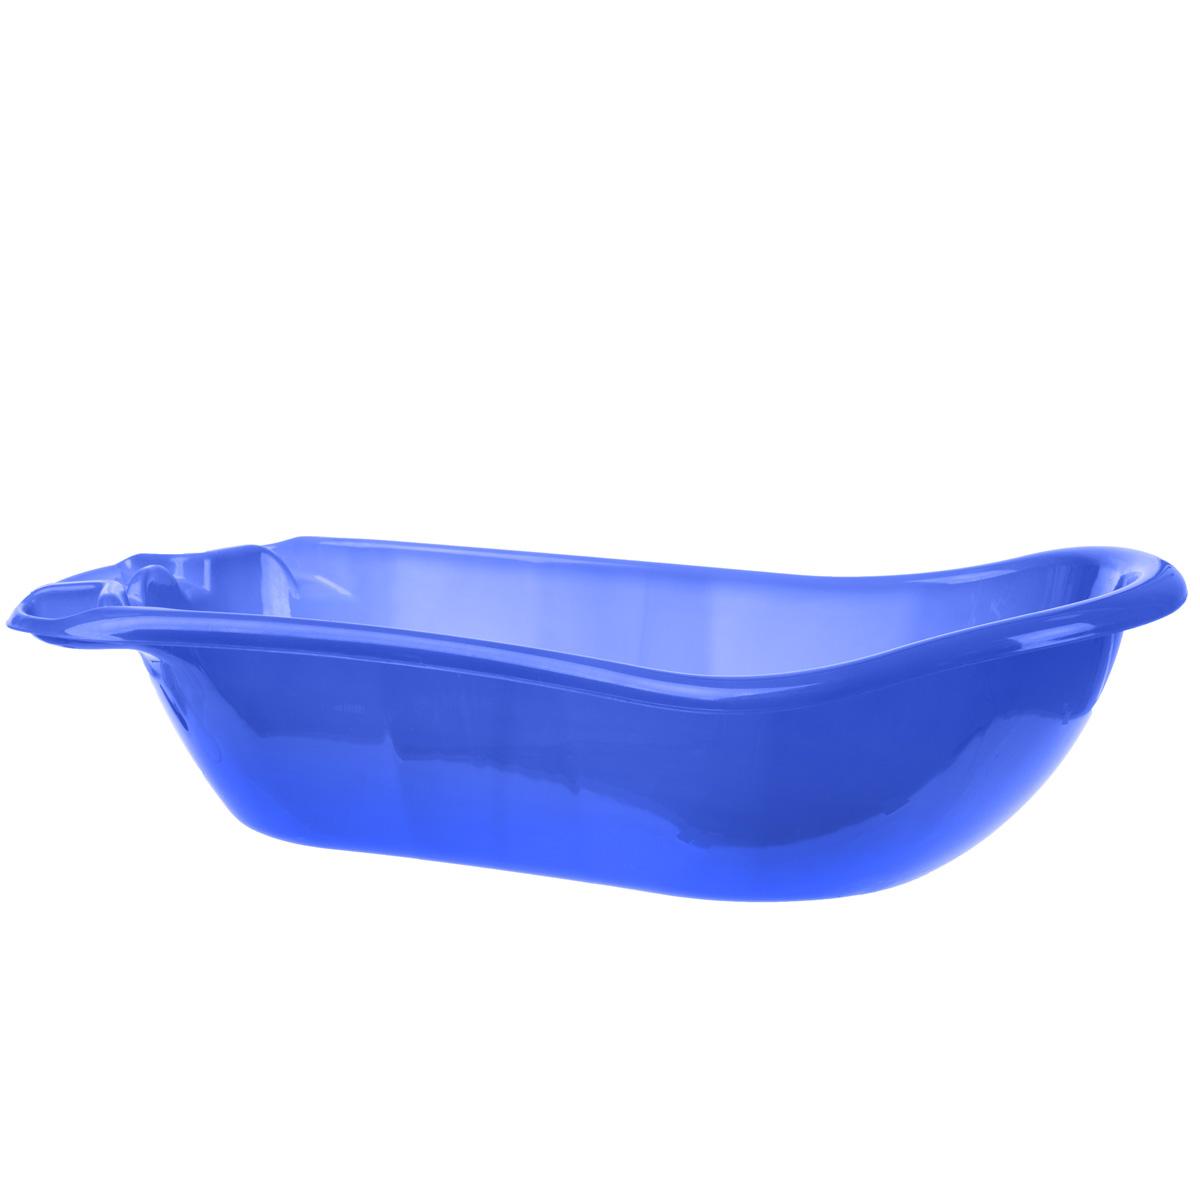 ����� ������� Dunya Plastik �������, ����: �����, 50 �� � 100 �� - Dunya Plastik12001����� �������� Dunya Plastik ������� �������� �������� ��� ������� ������. �����, ������������� �� �������� ����������� ��������� ��� ���������� ��������� �������, ����� ������� ������ ��� ���� � ������ ��������������� � ��������� ������������. ������ �����: 50 �� � 100 �� � 26 ��.